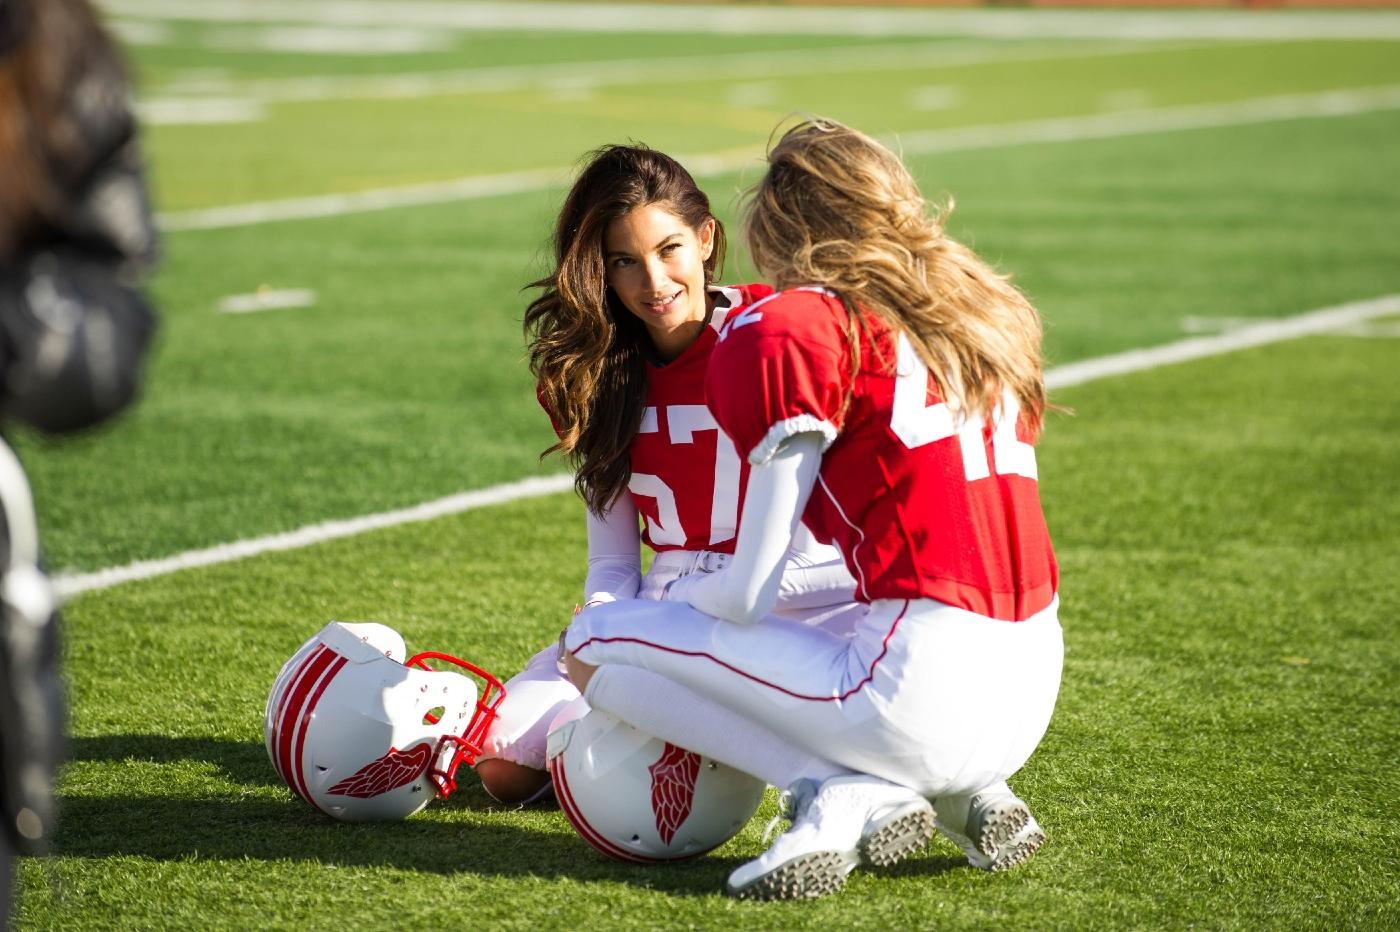 Valentines Day Super Bowl 2015 Behind The Scenes Victorias Secret 15